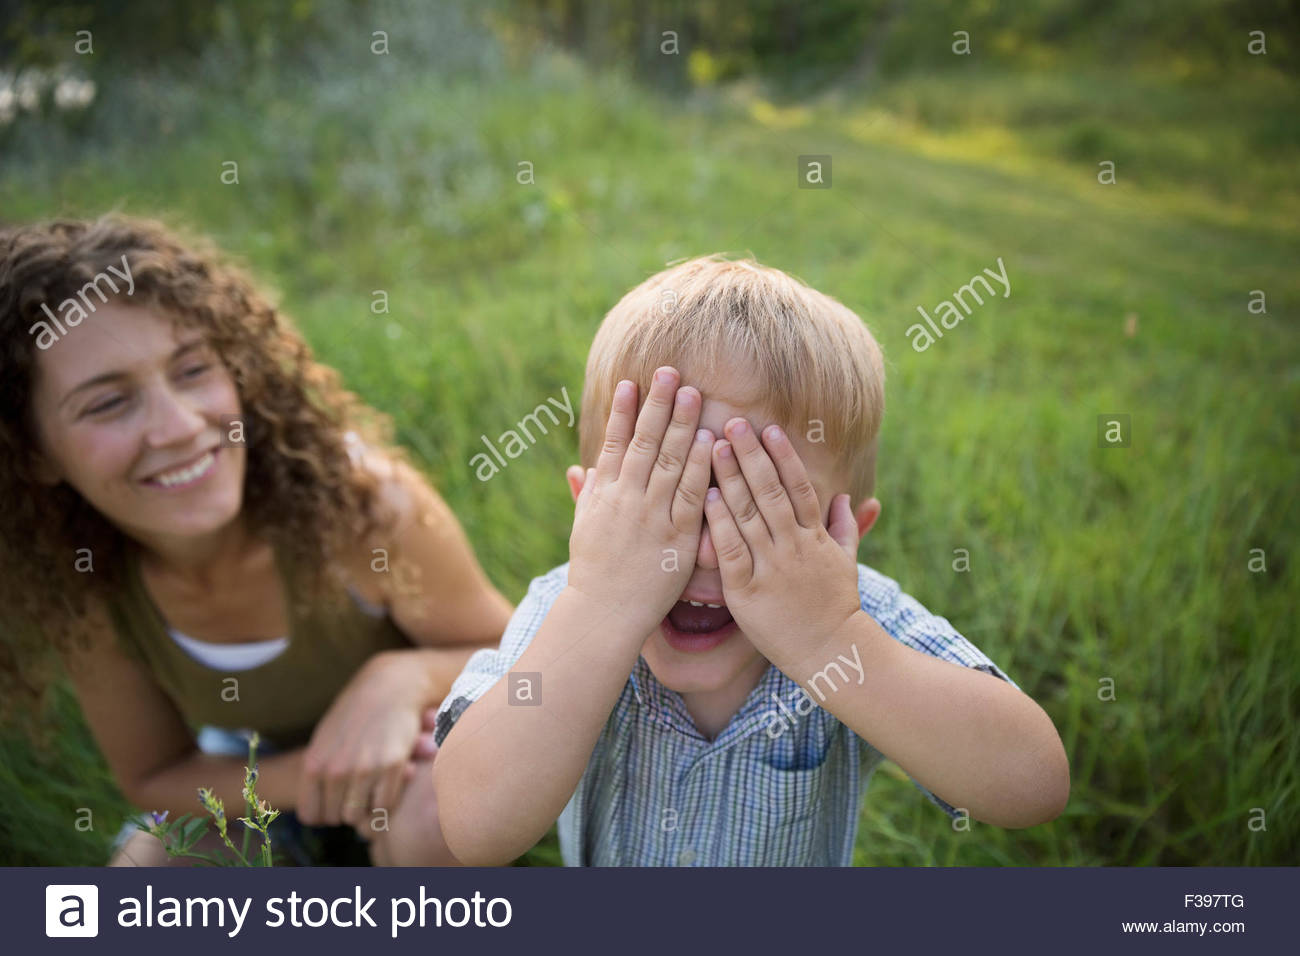 Portrait mère regardant fils jouer peek-a-boo Photo Stock